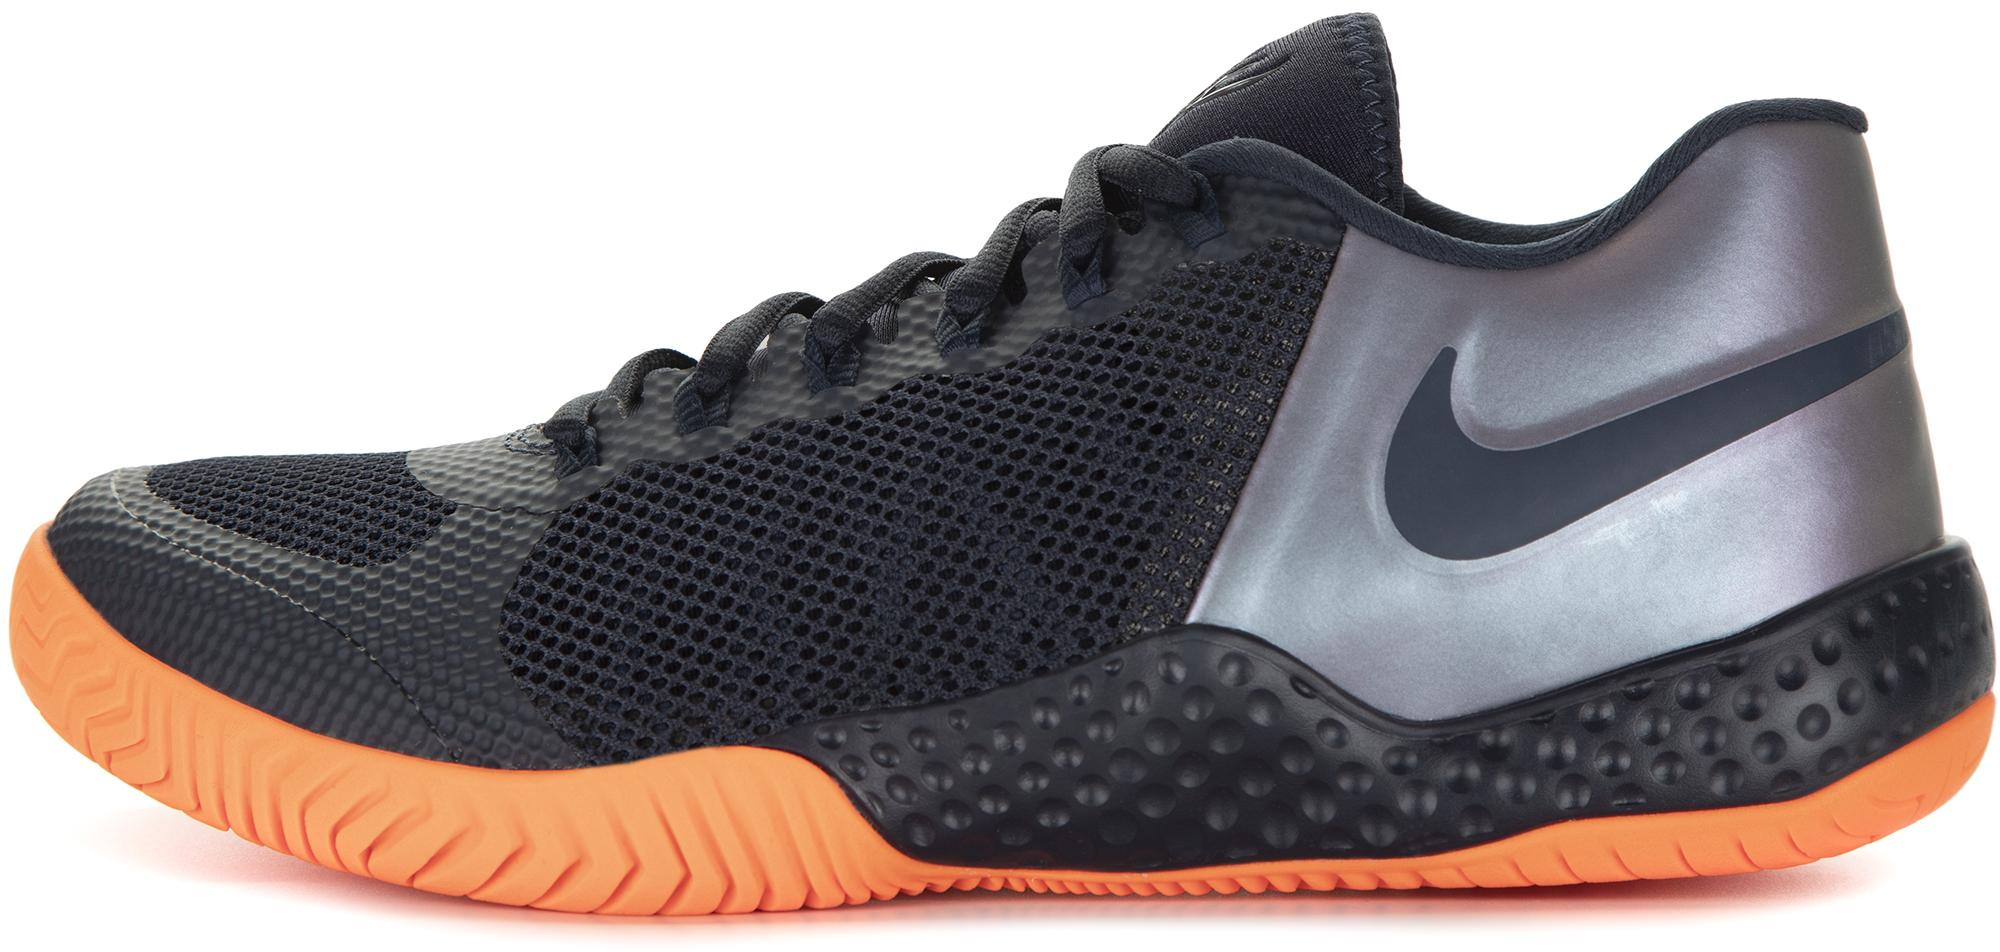 Nike Кроссовки женские Nike Court Flare 2 QS, размер 40 nike кроссовки для мальчиков nike city court 7 размер 31